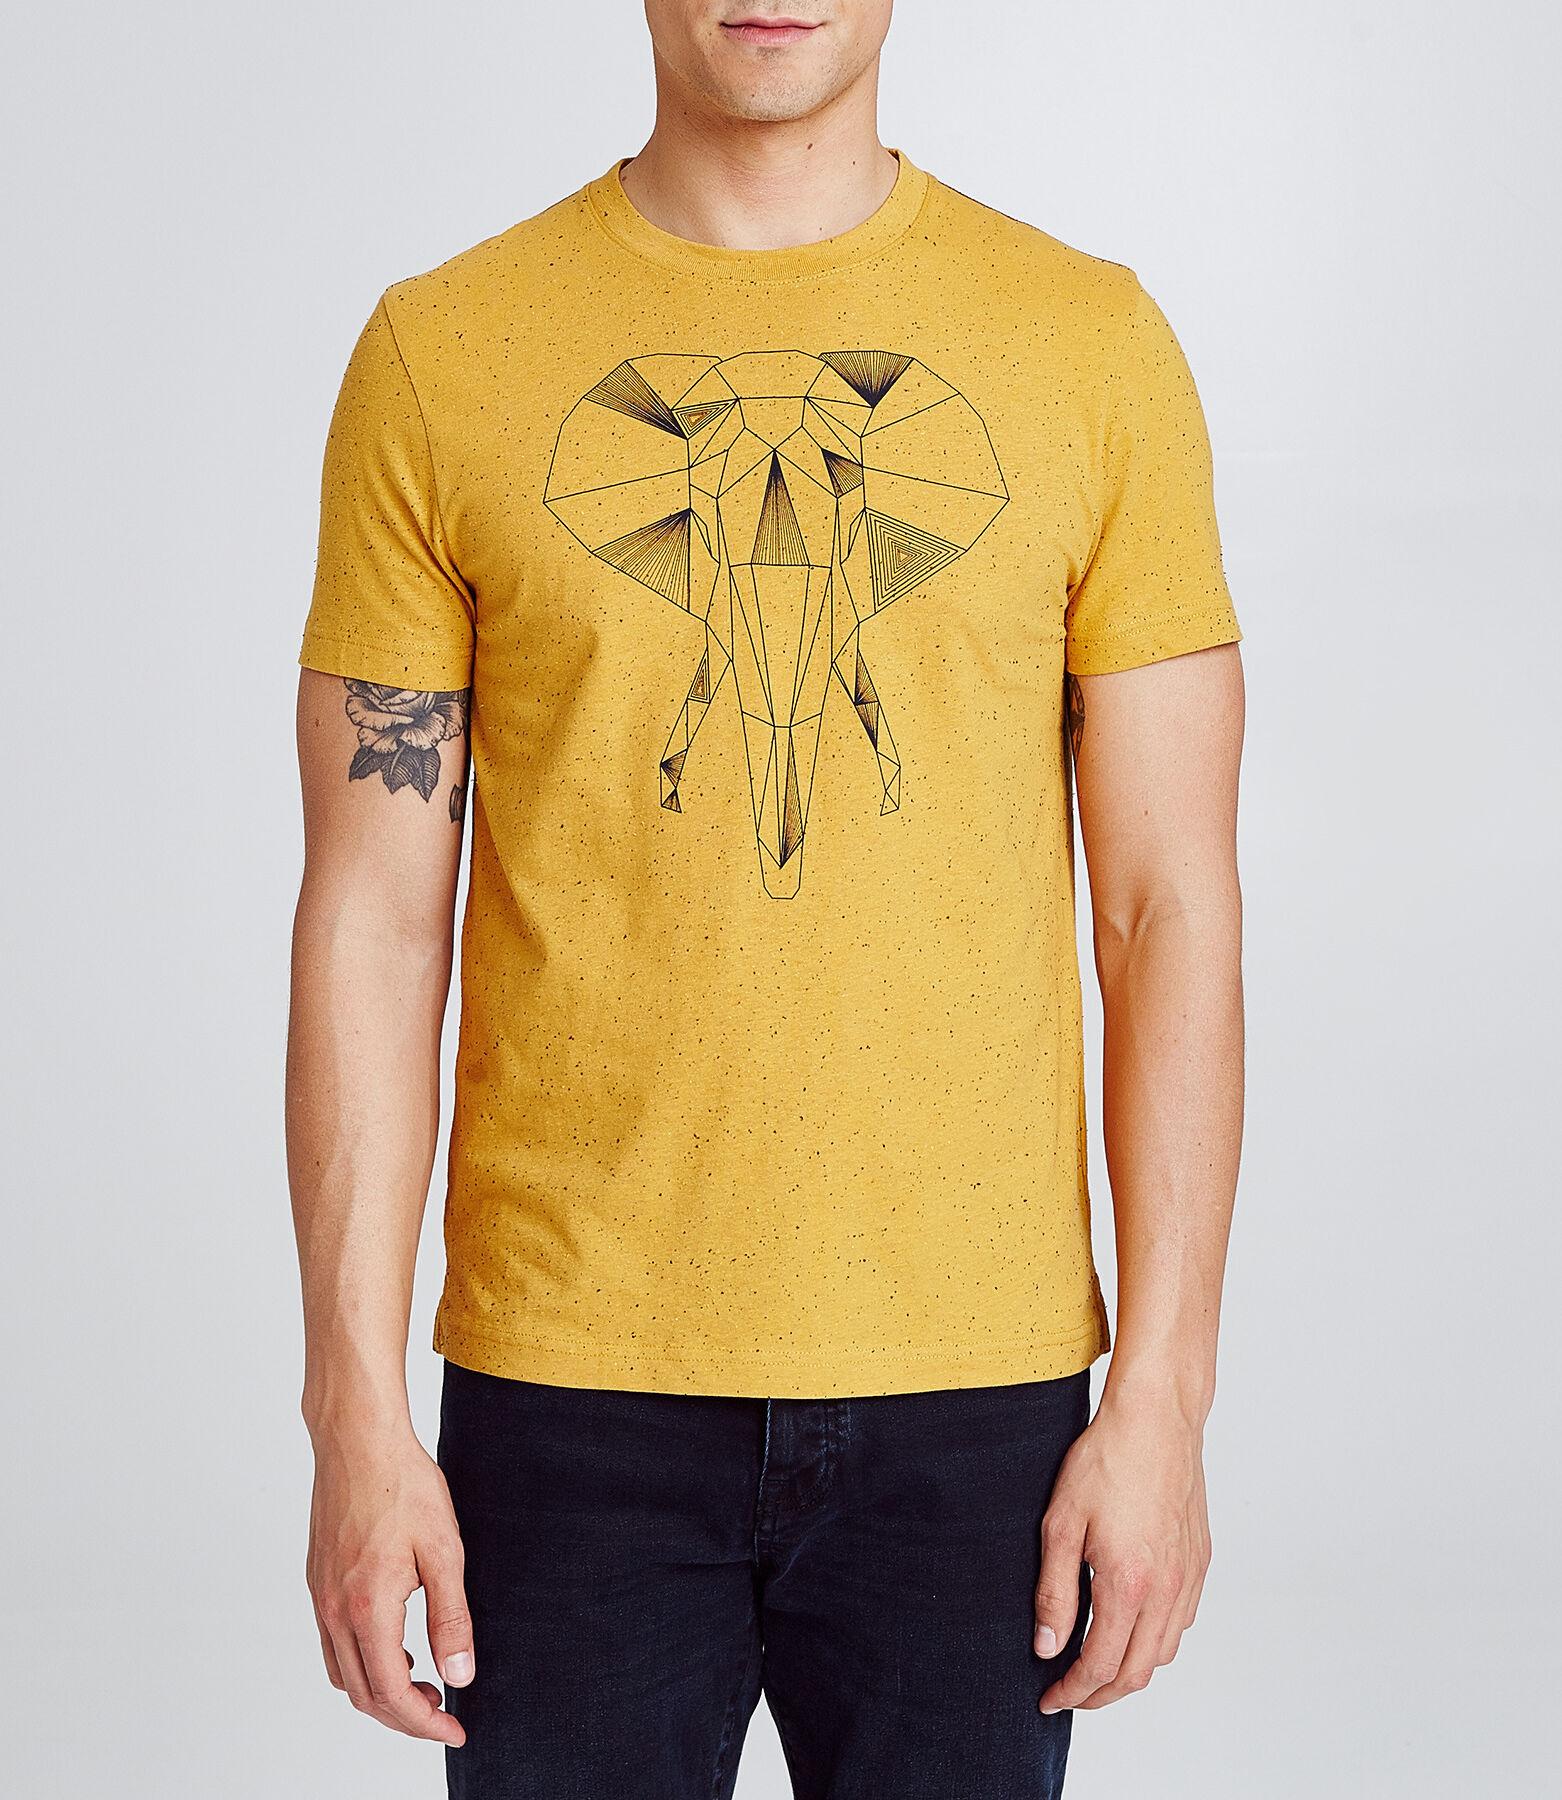 T-shirt met print van olifant